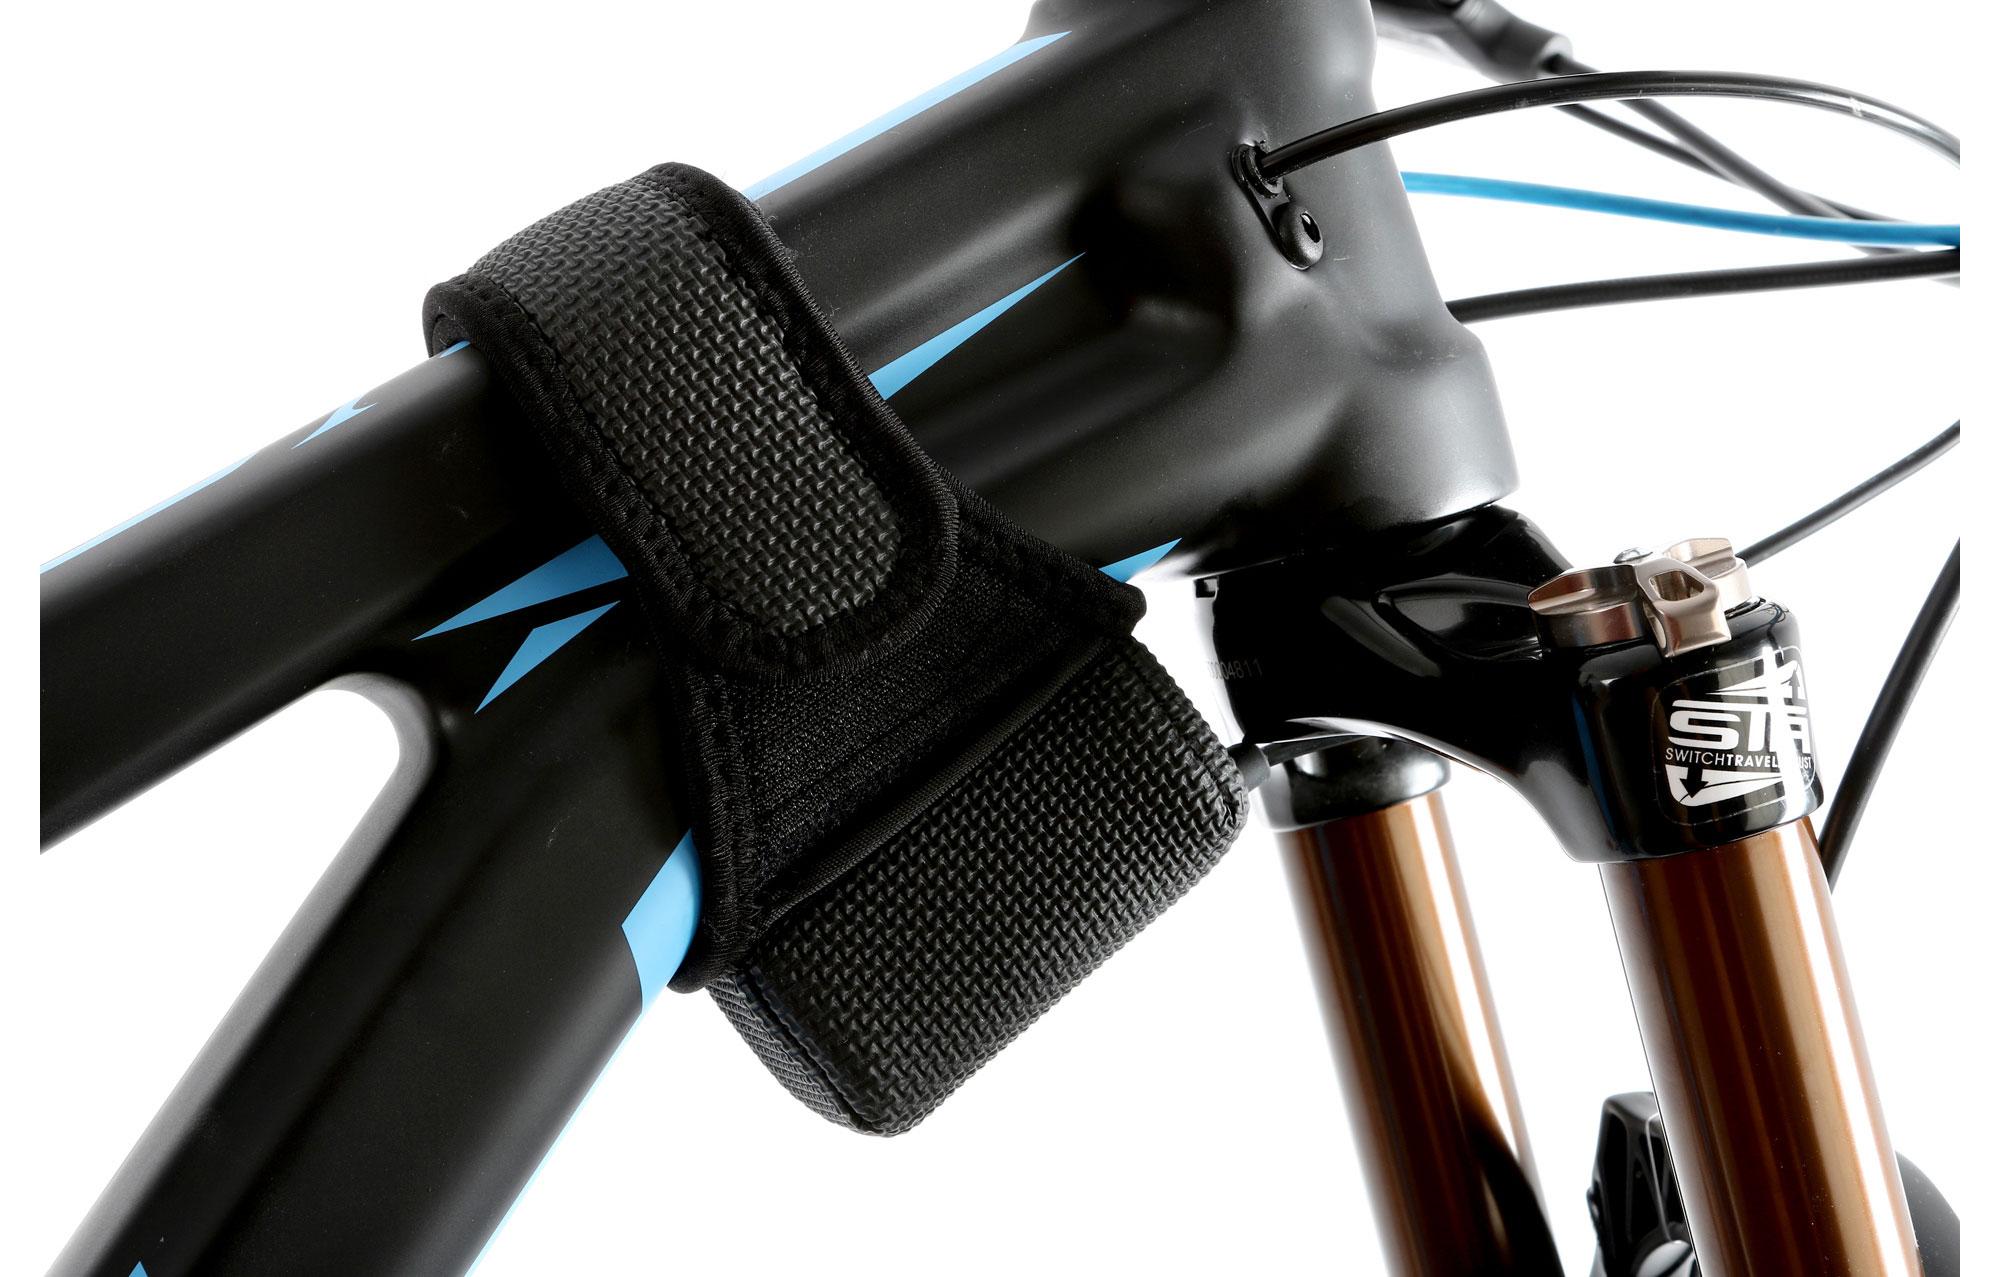 MSC BIKES Bicycle light 2000 Lumens Black